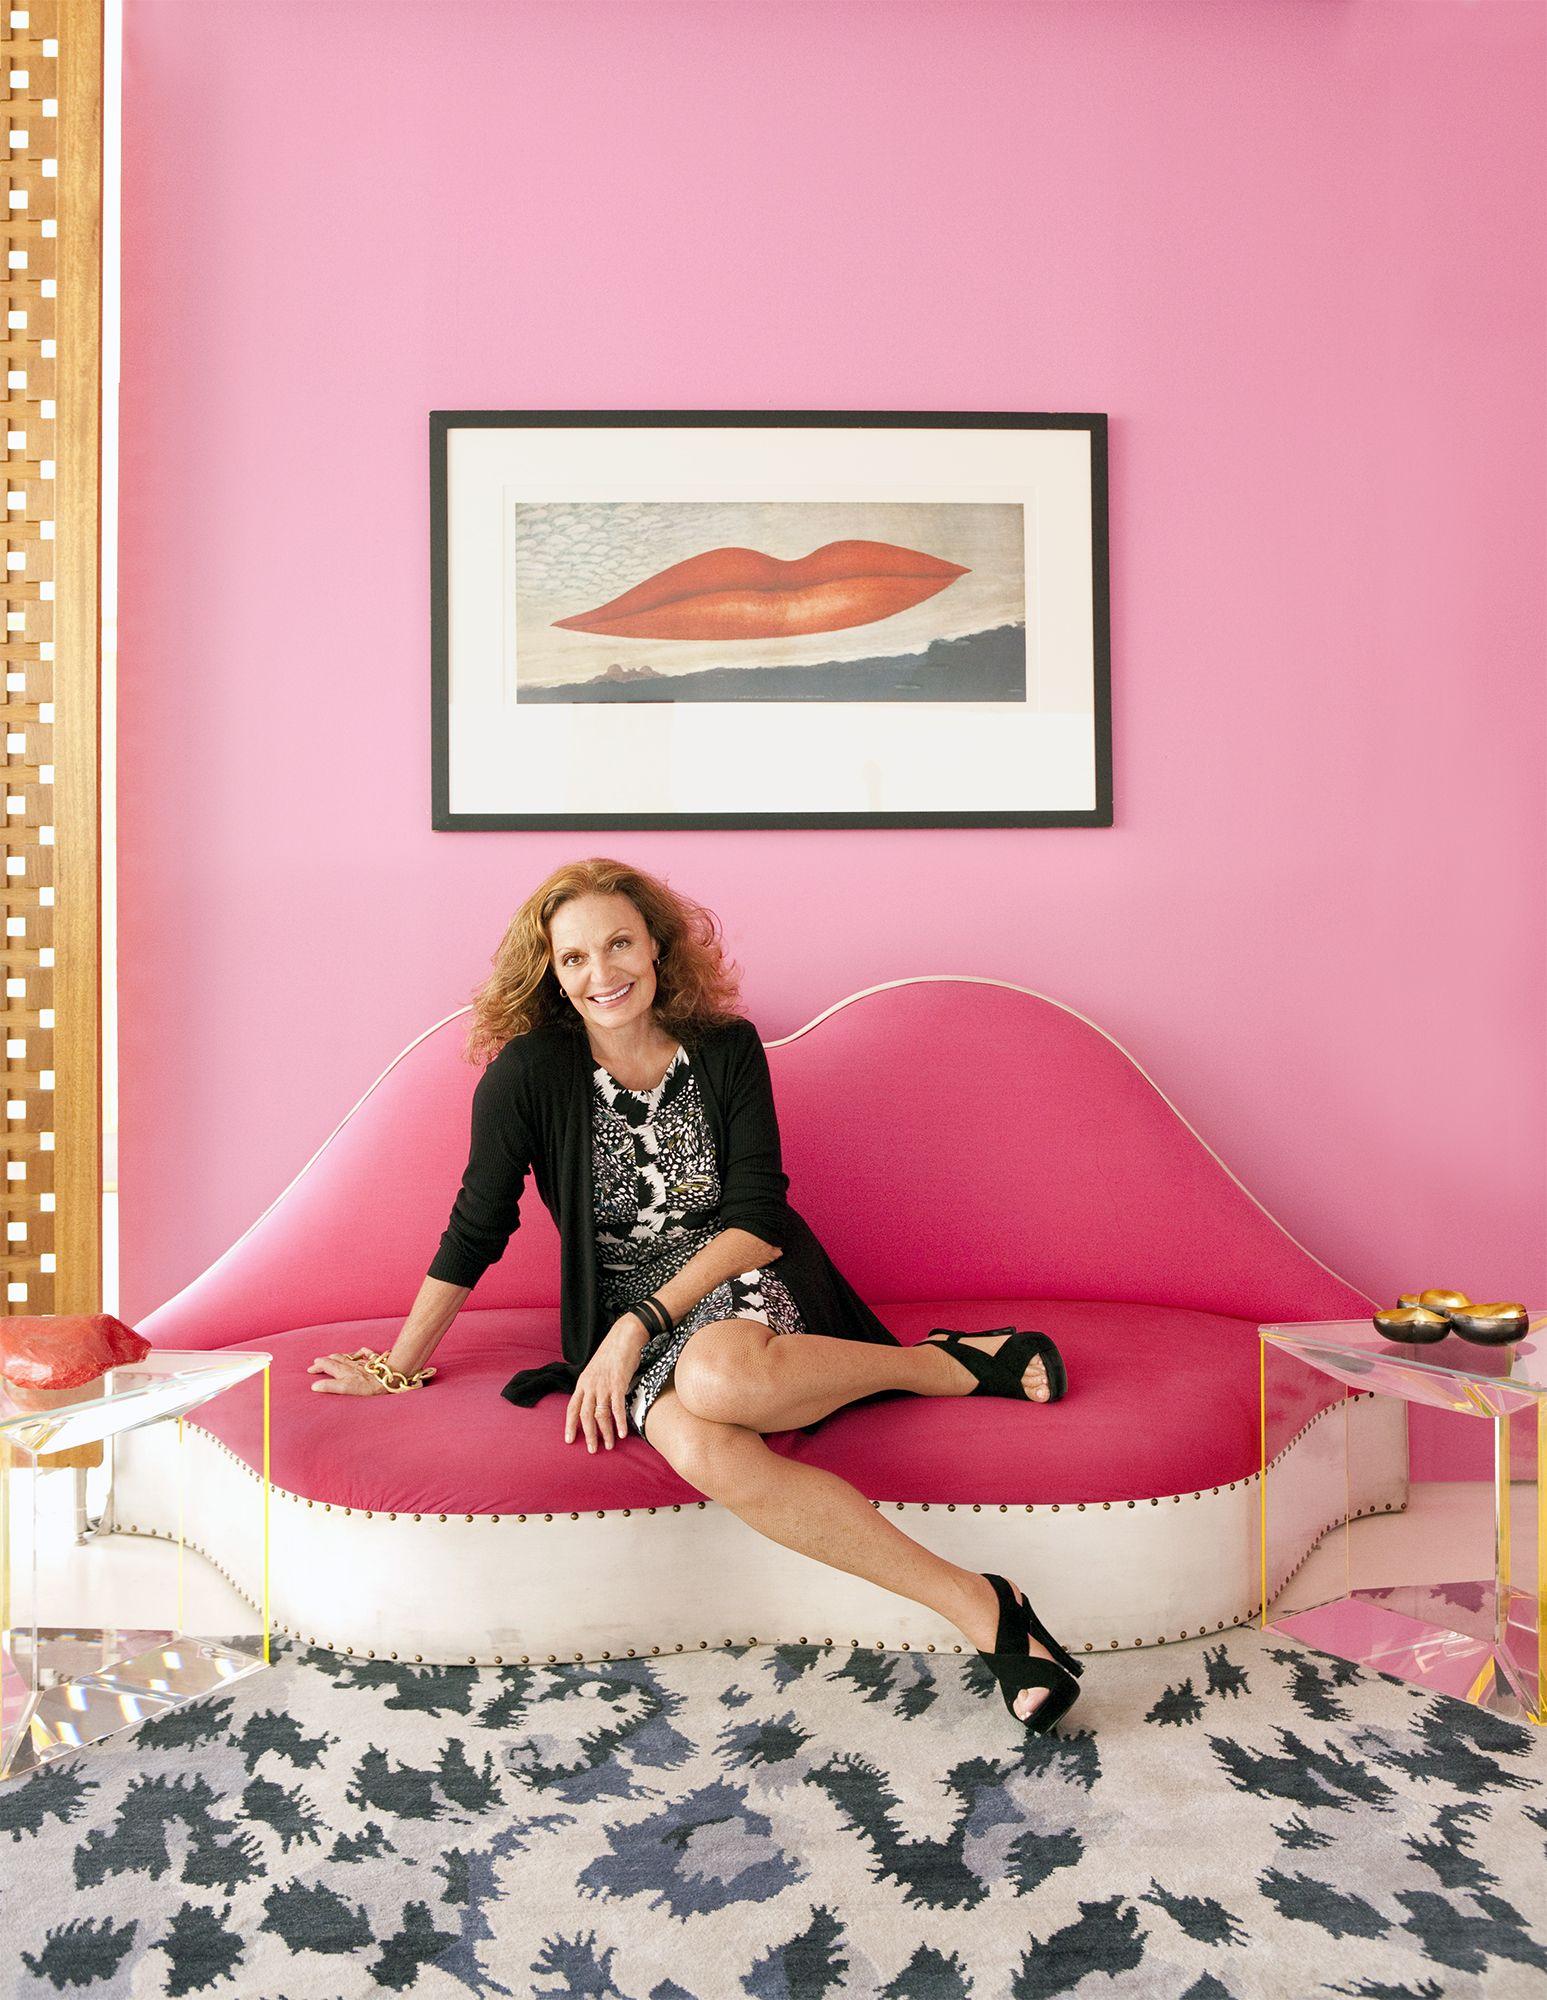 sofa - famous people